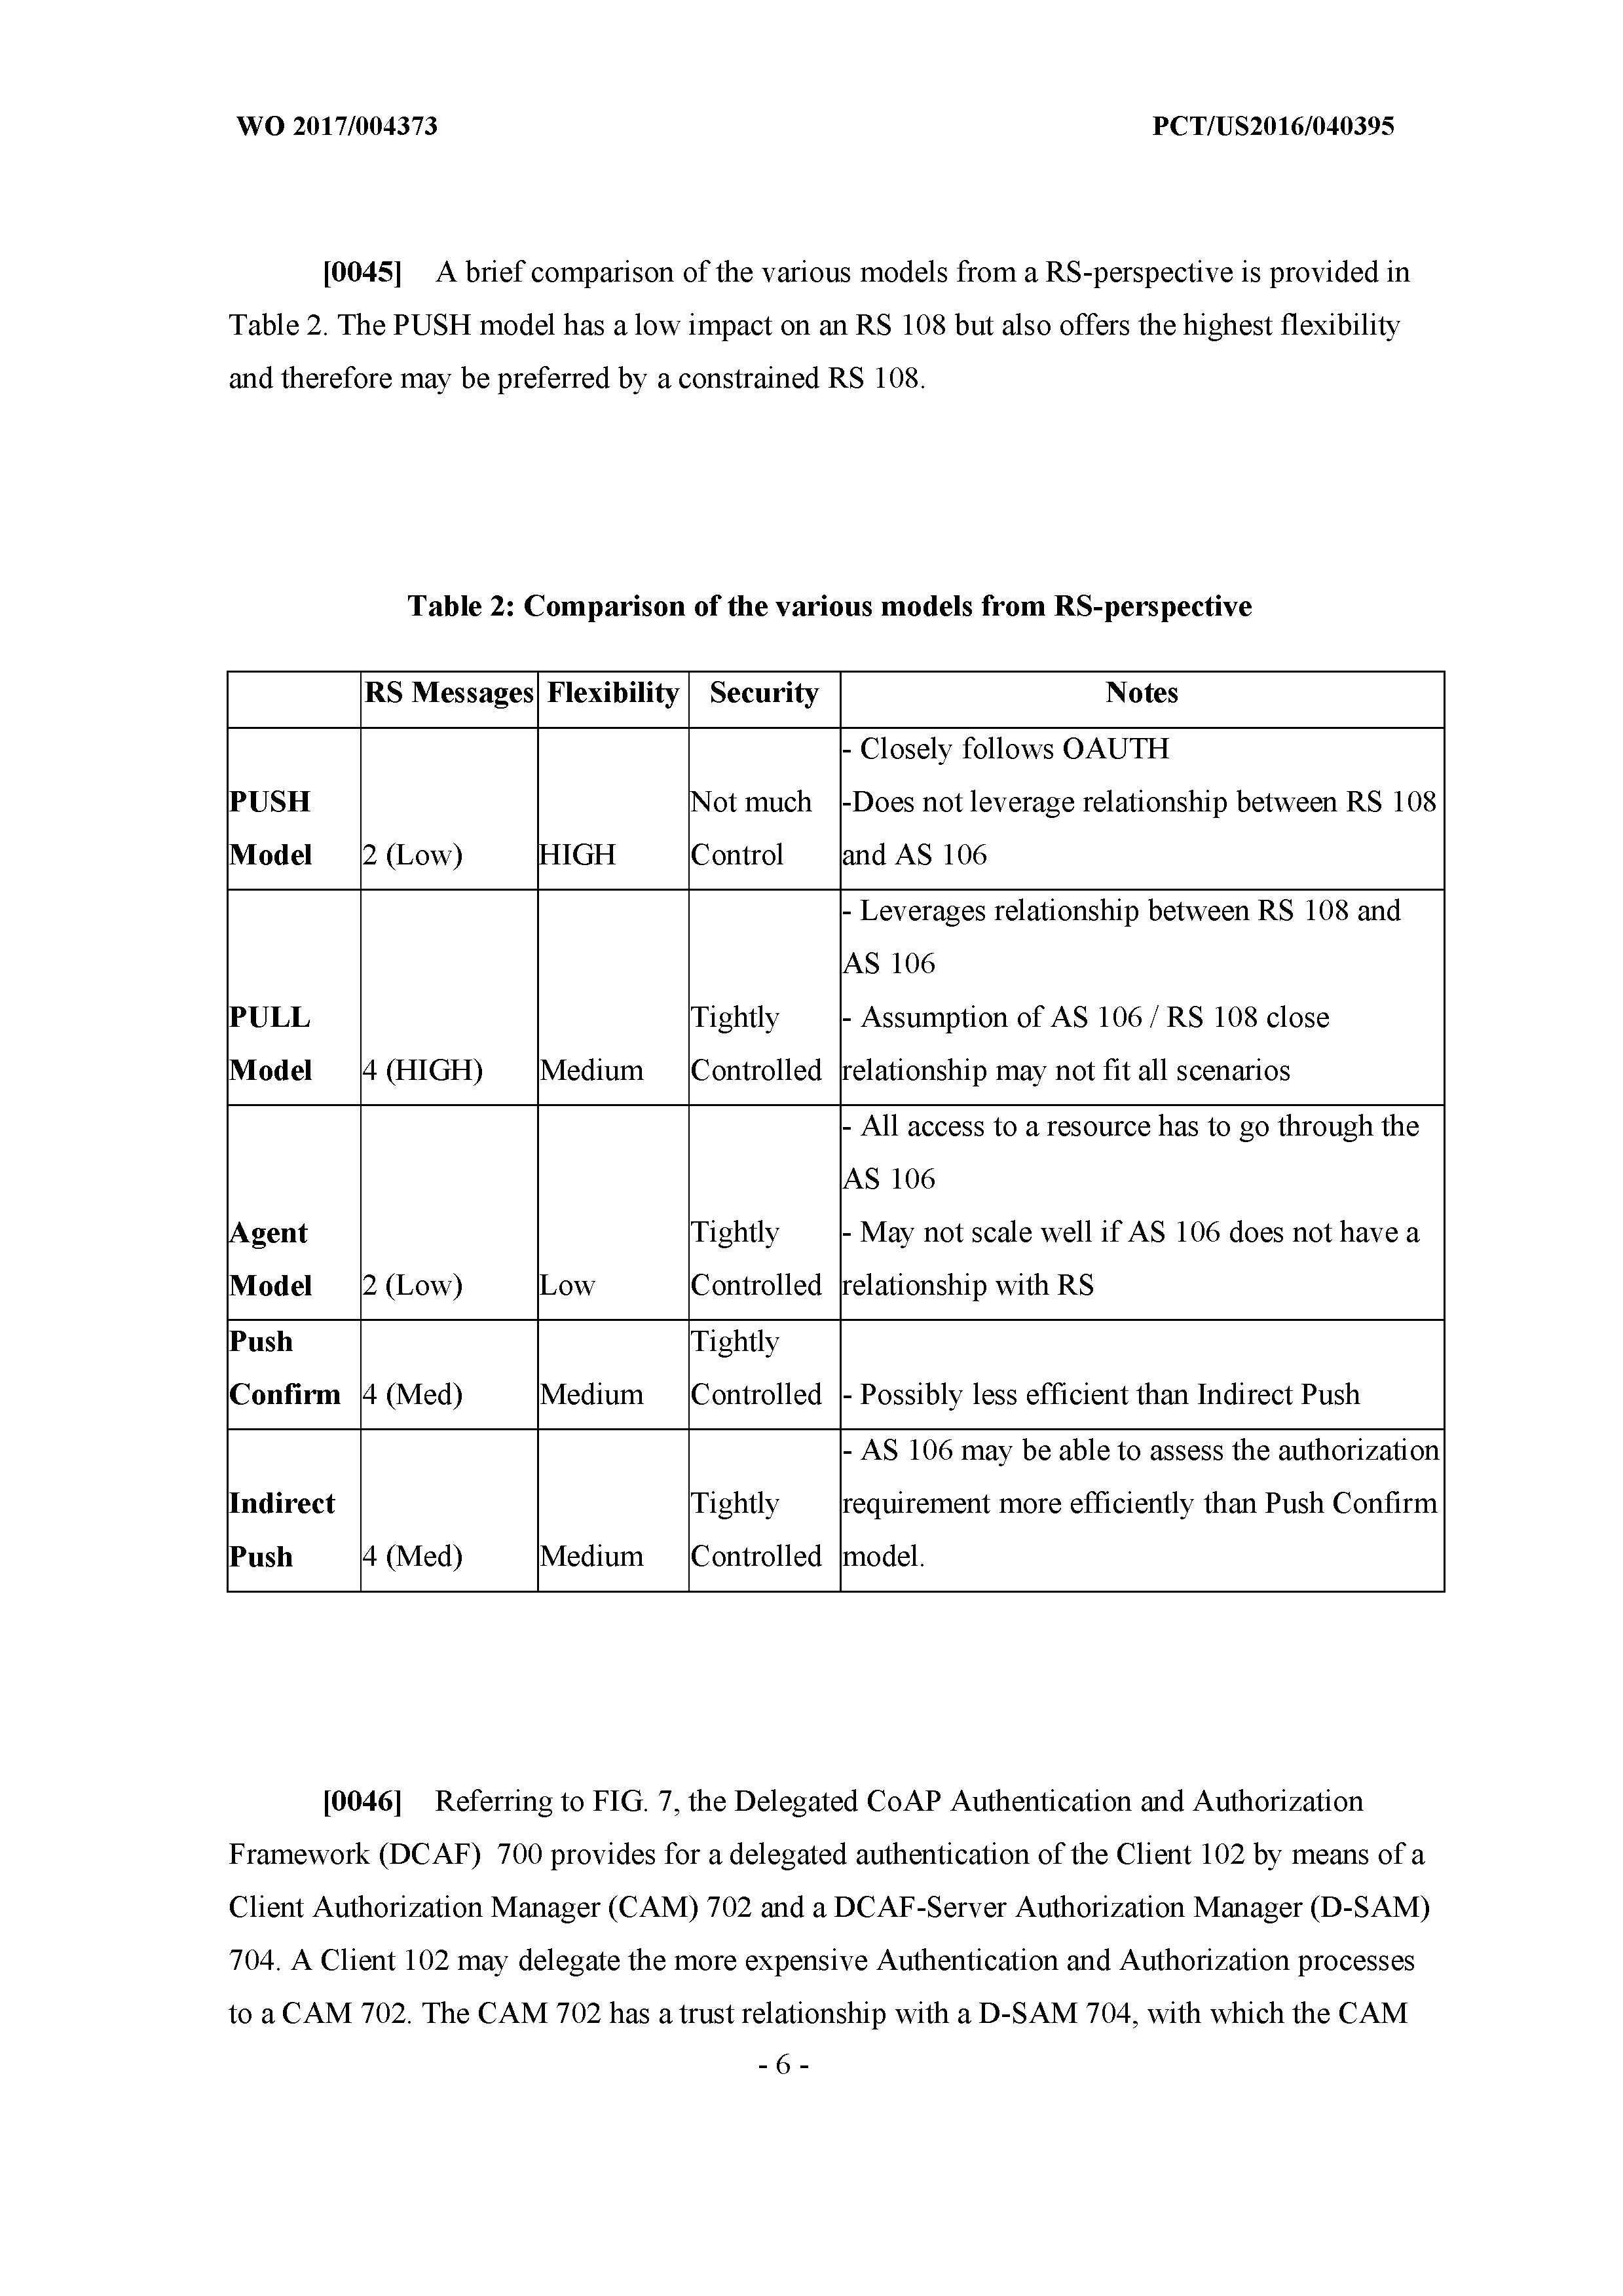 WO 2017/004373 A1 - Resource-driven Dynamic Authorization